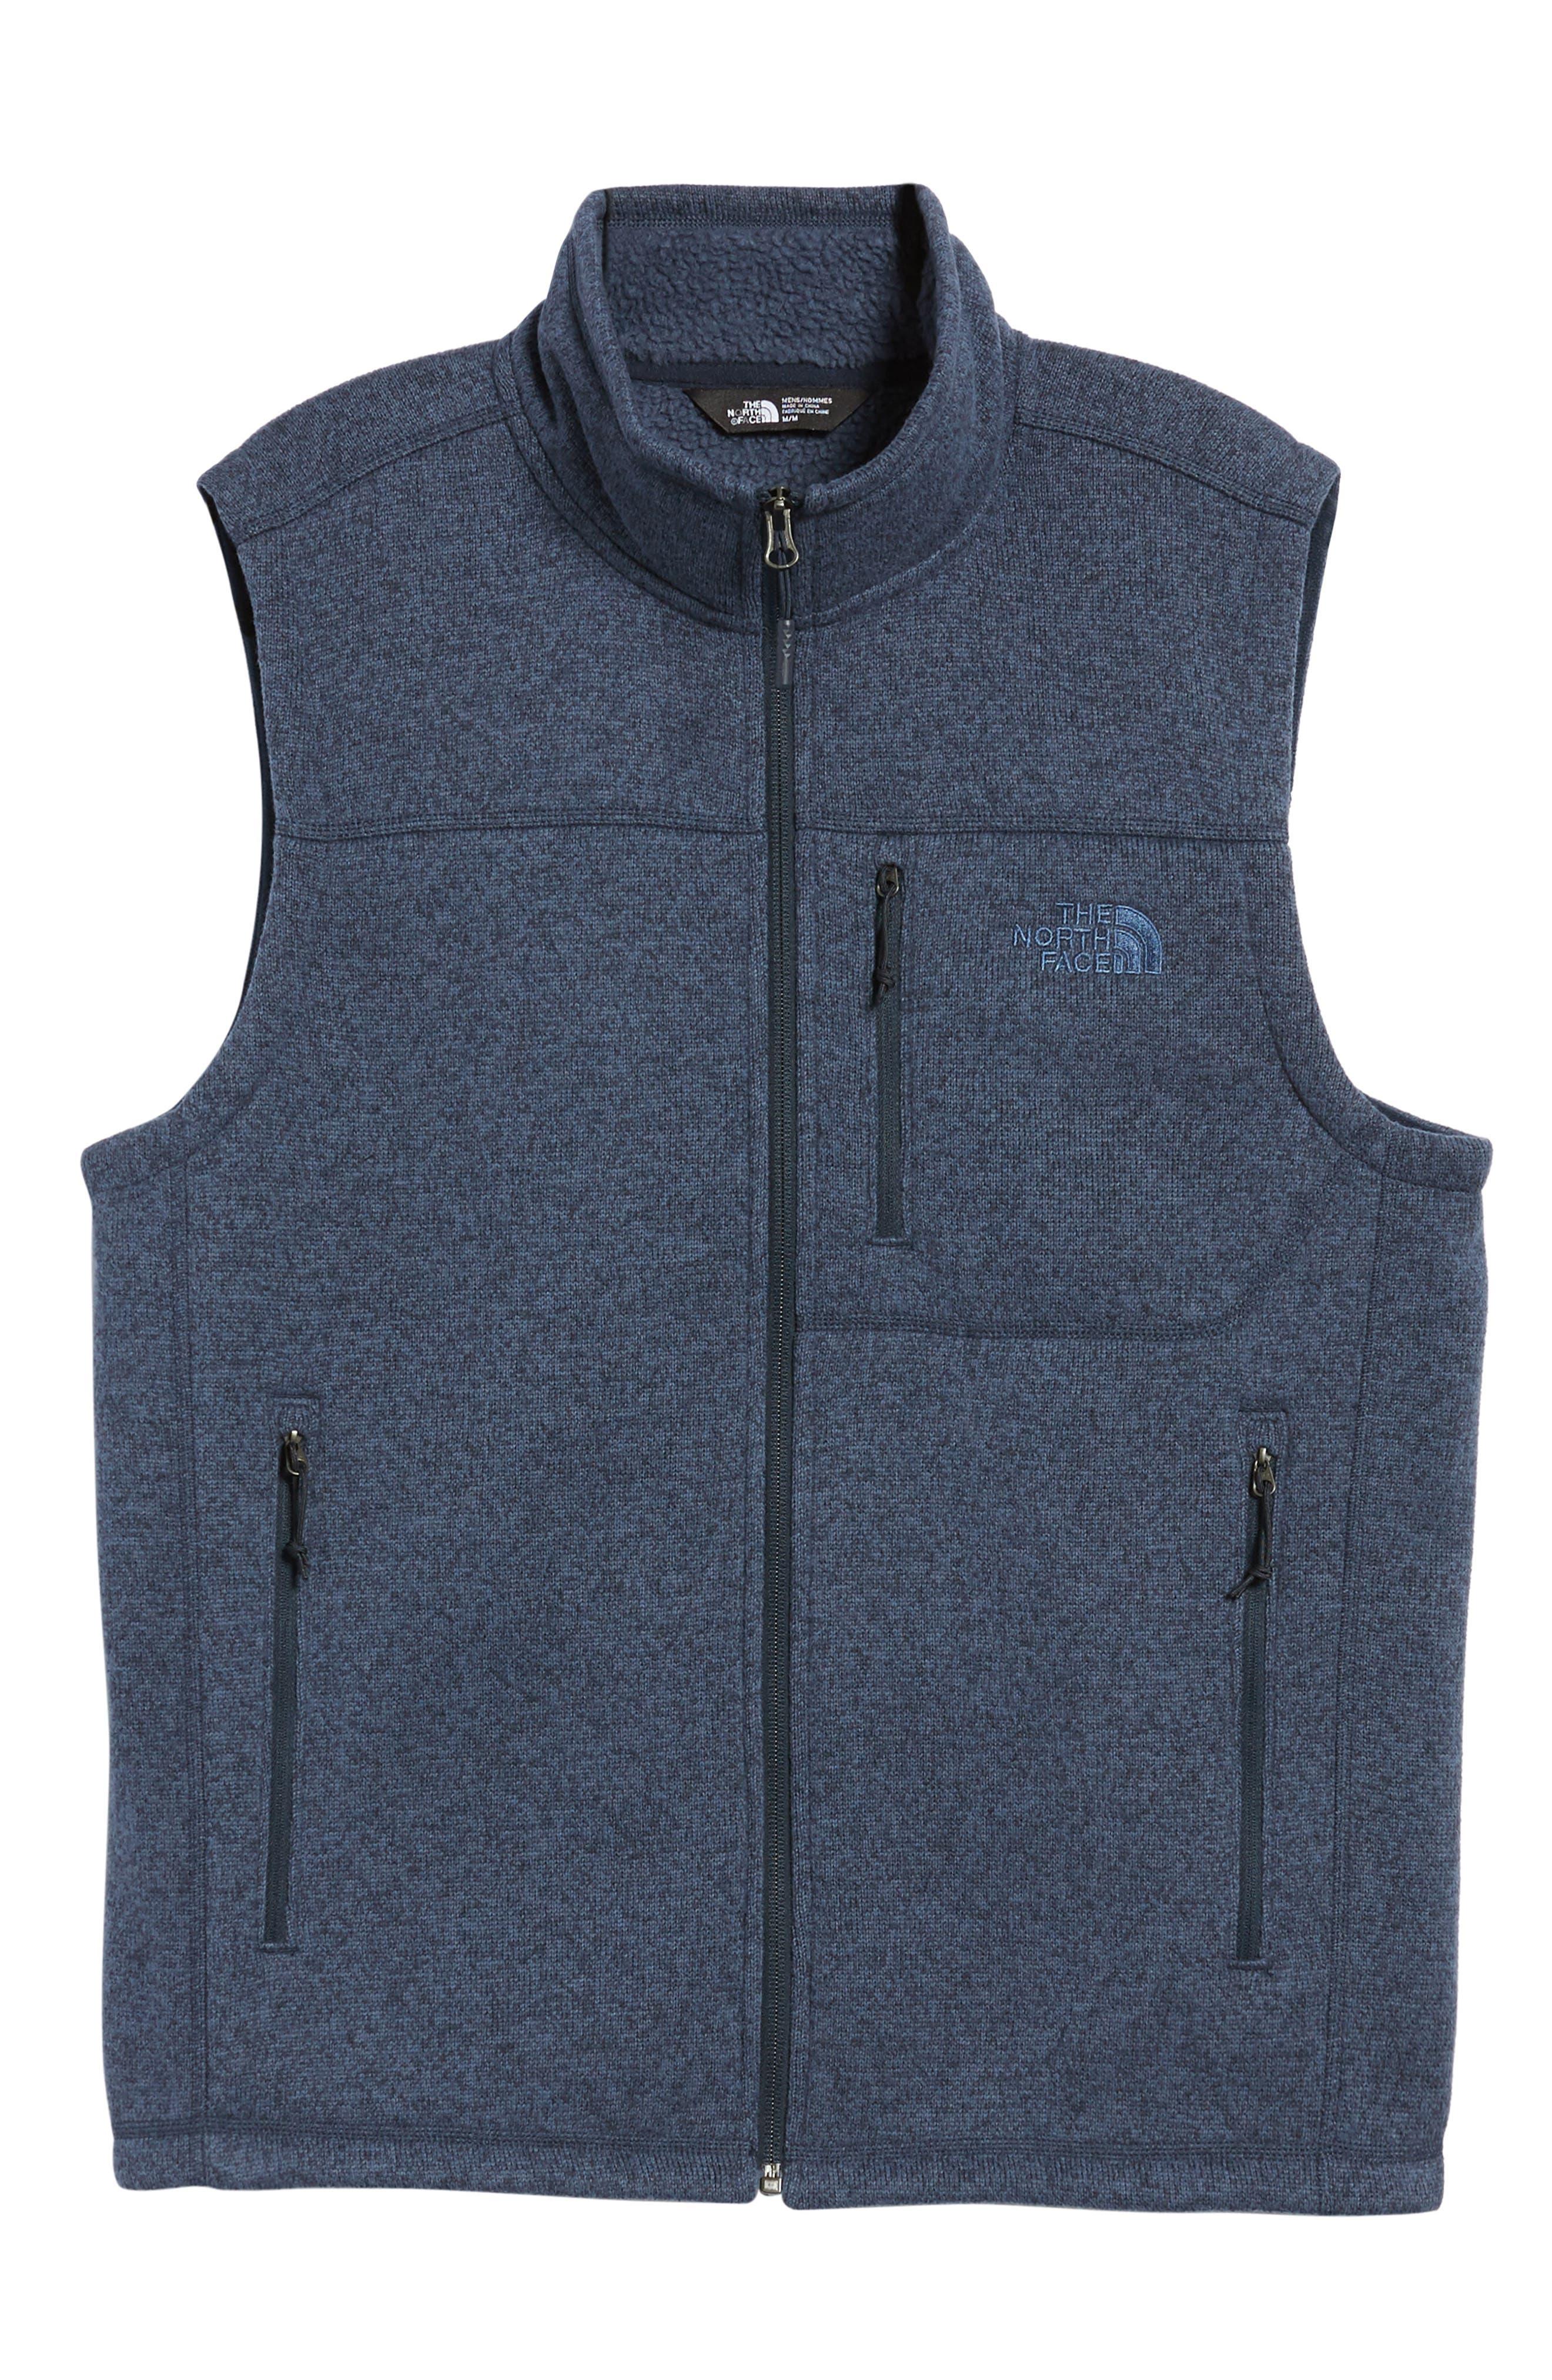 Gordon Lyons Zip Fleece Vest,                             Alternate thumbnail 25, color,